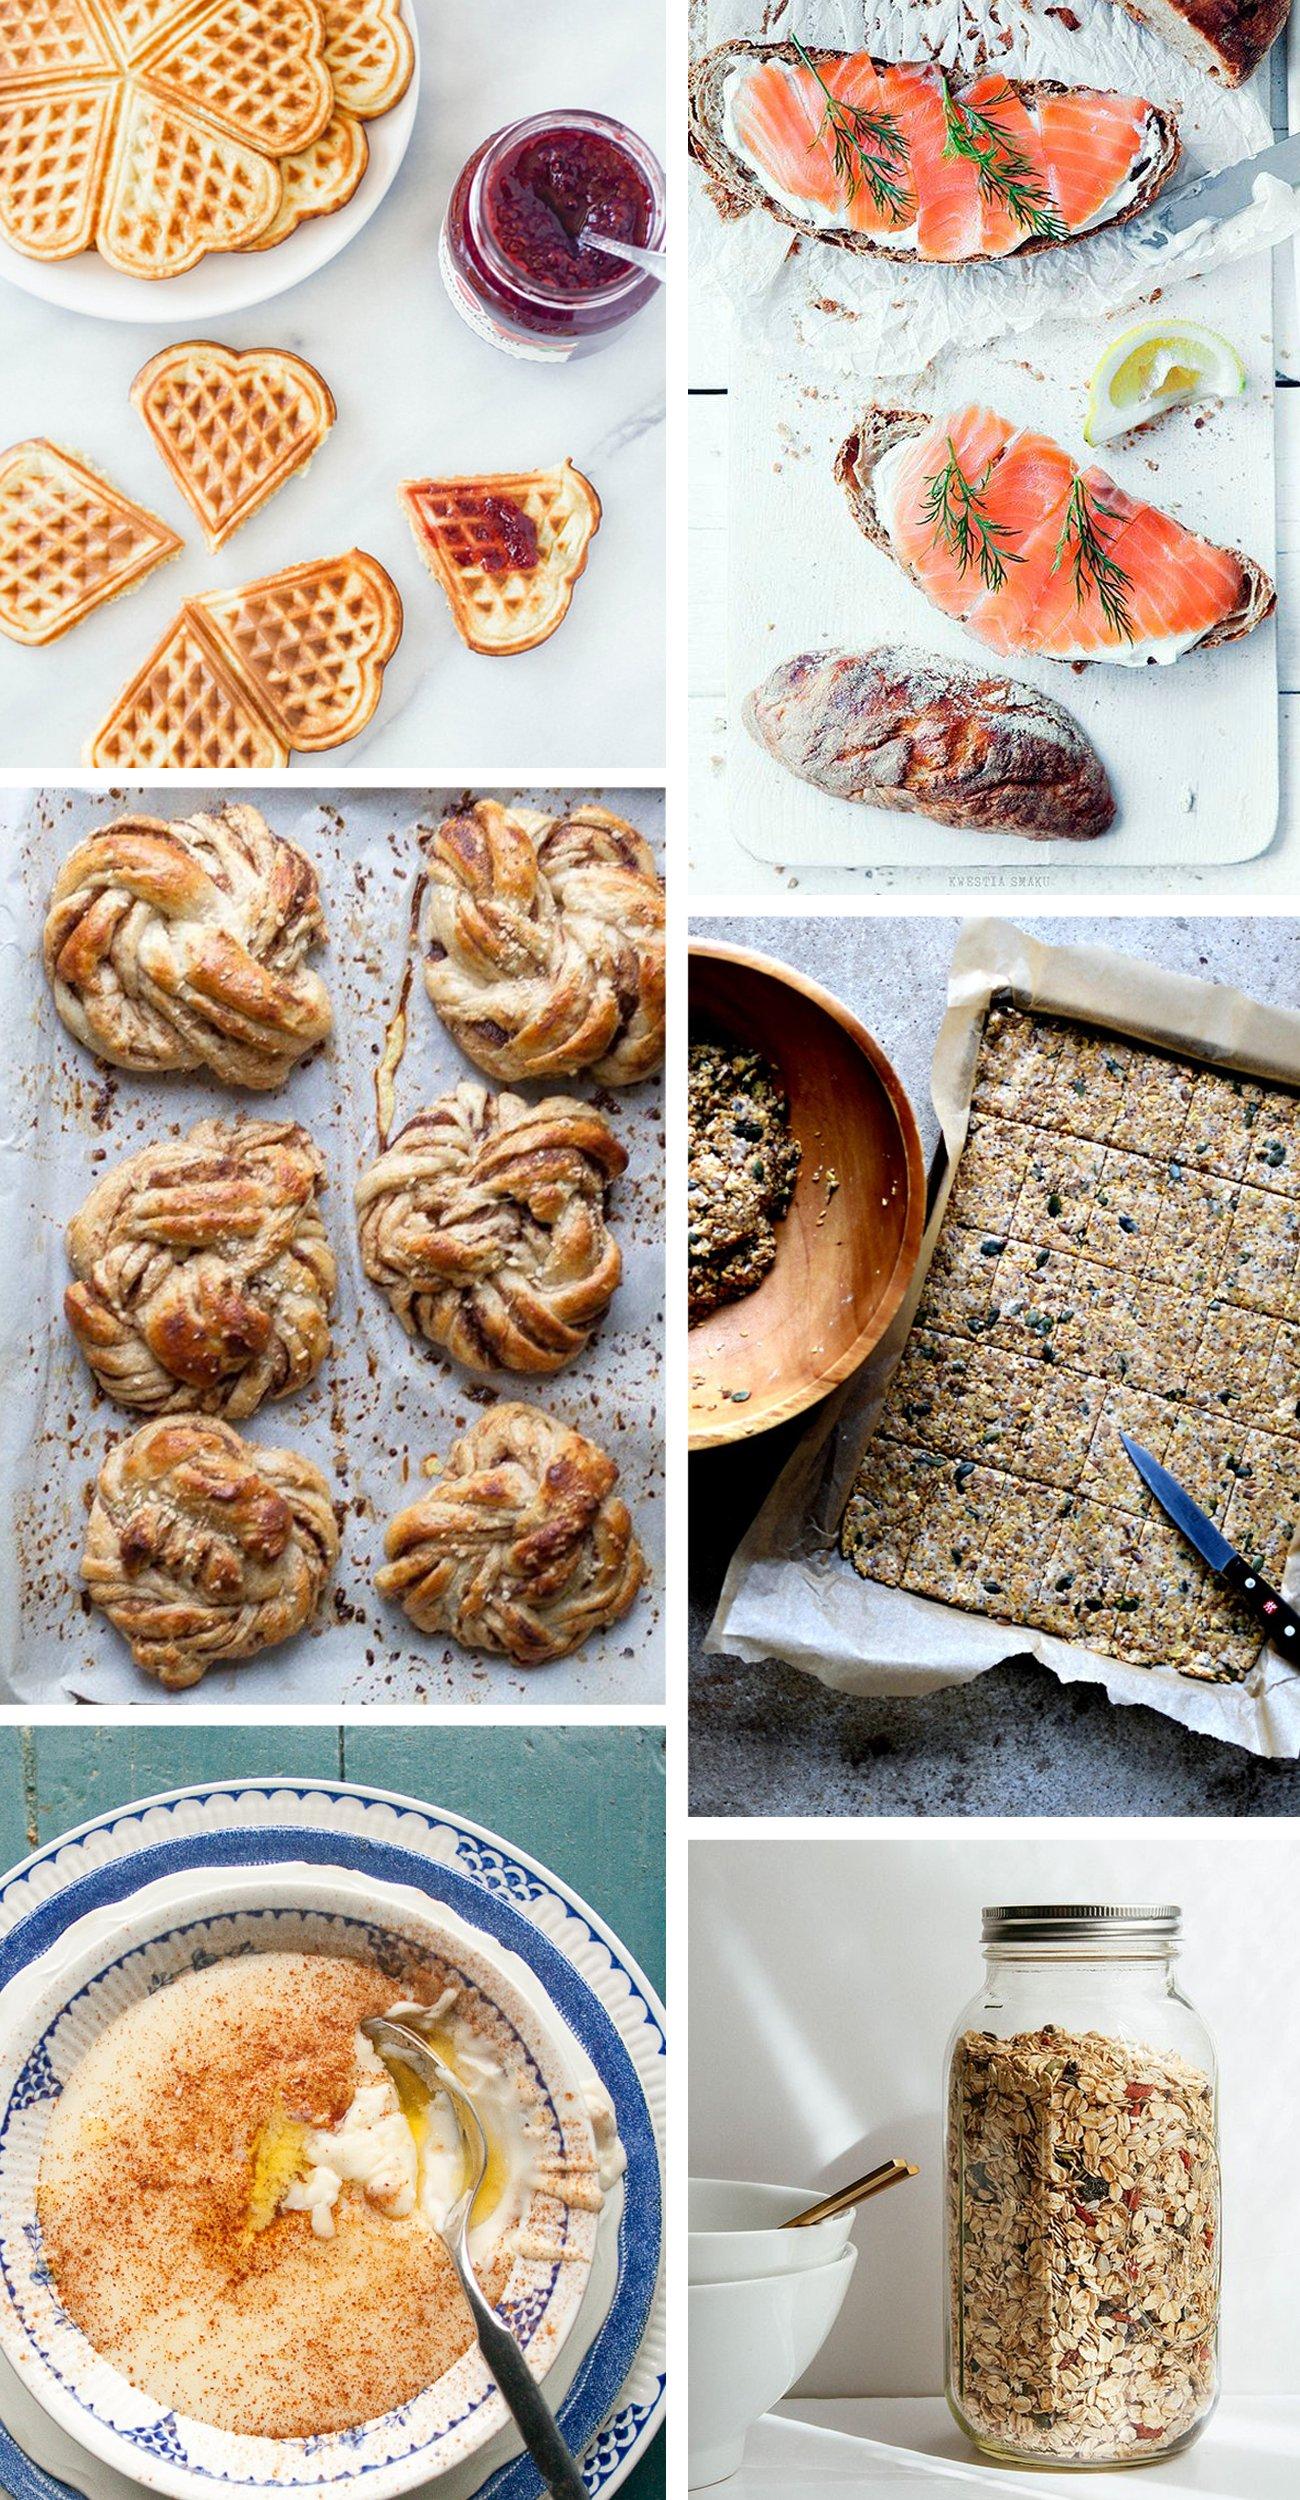 scandinavian breakfast ideas inspiration